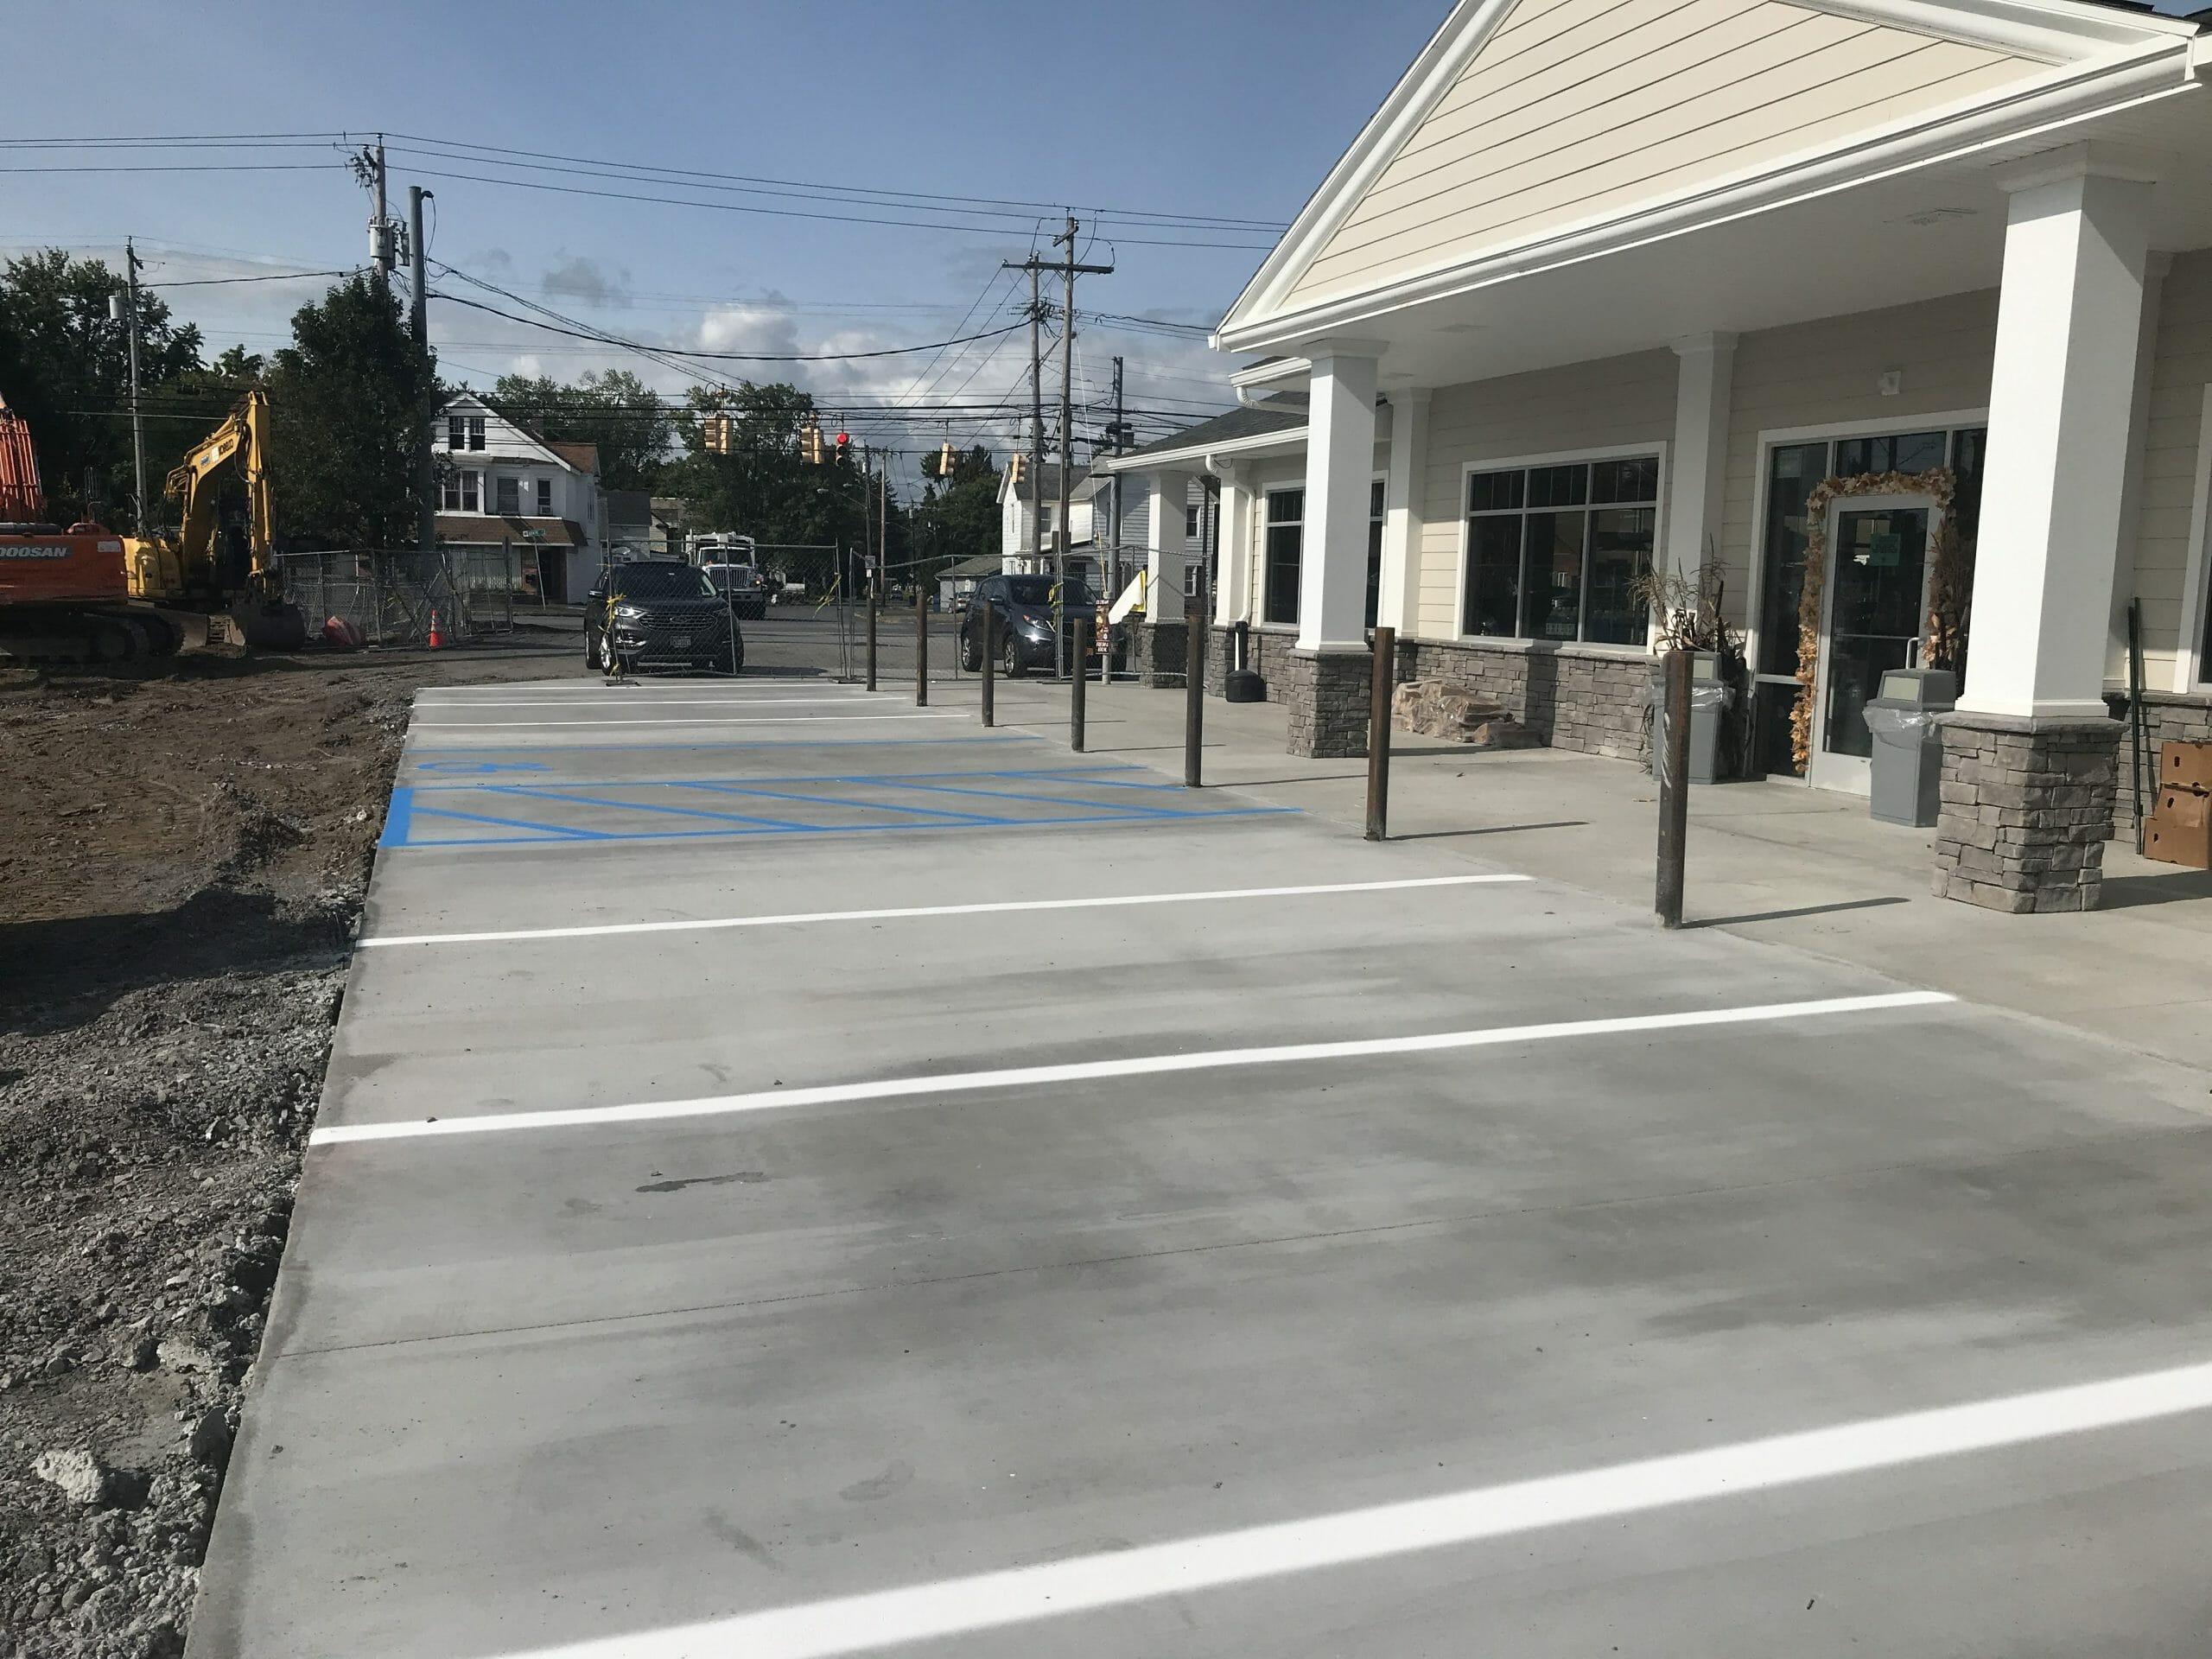 Stewarts Shop parking spots